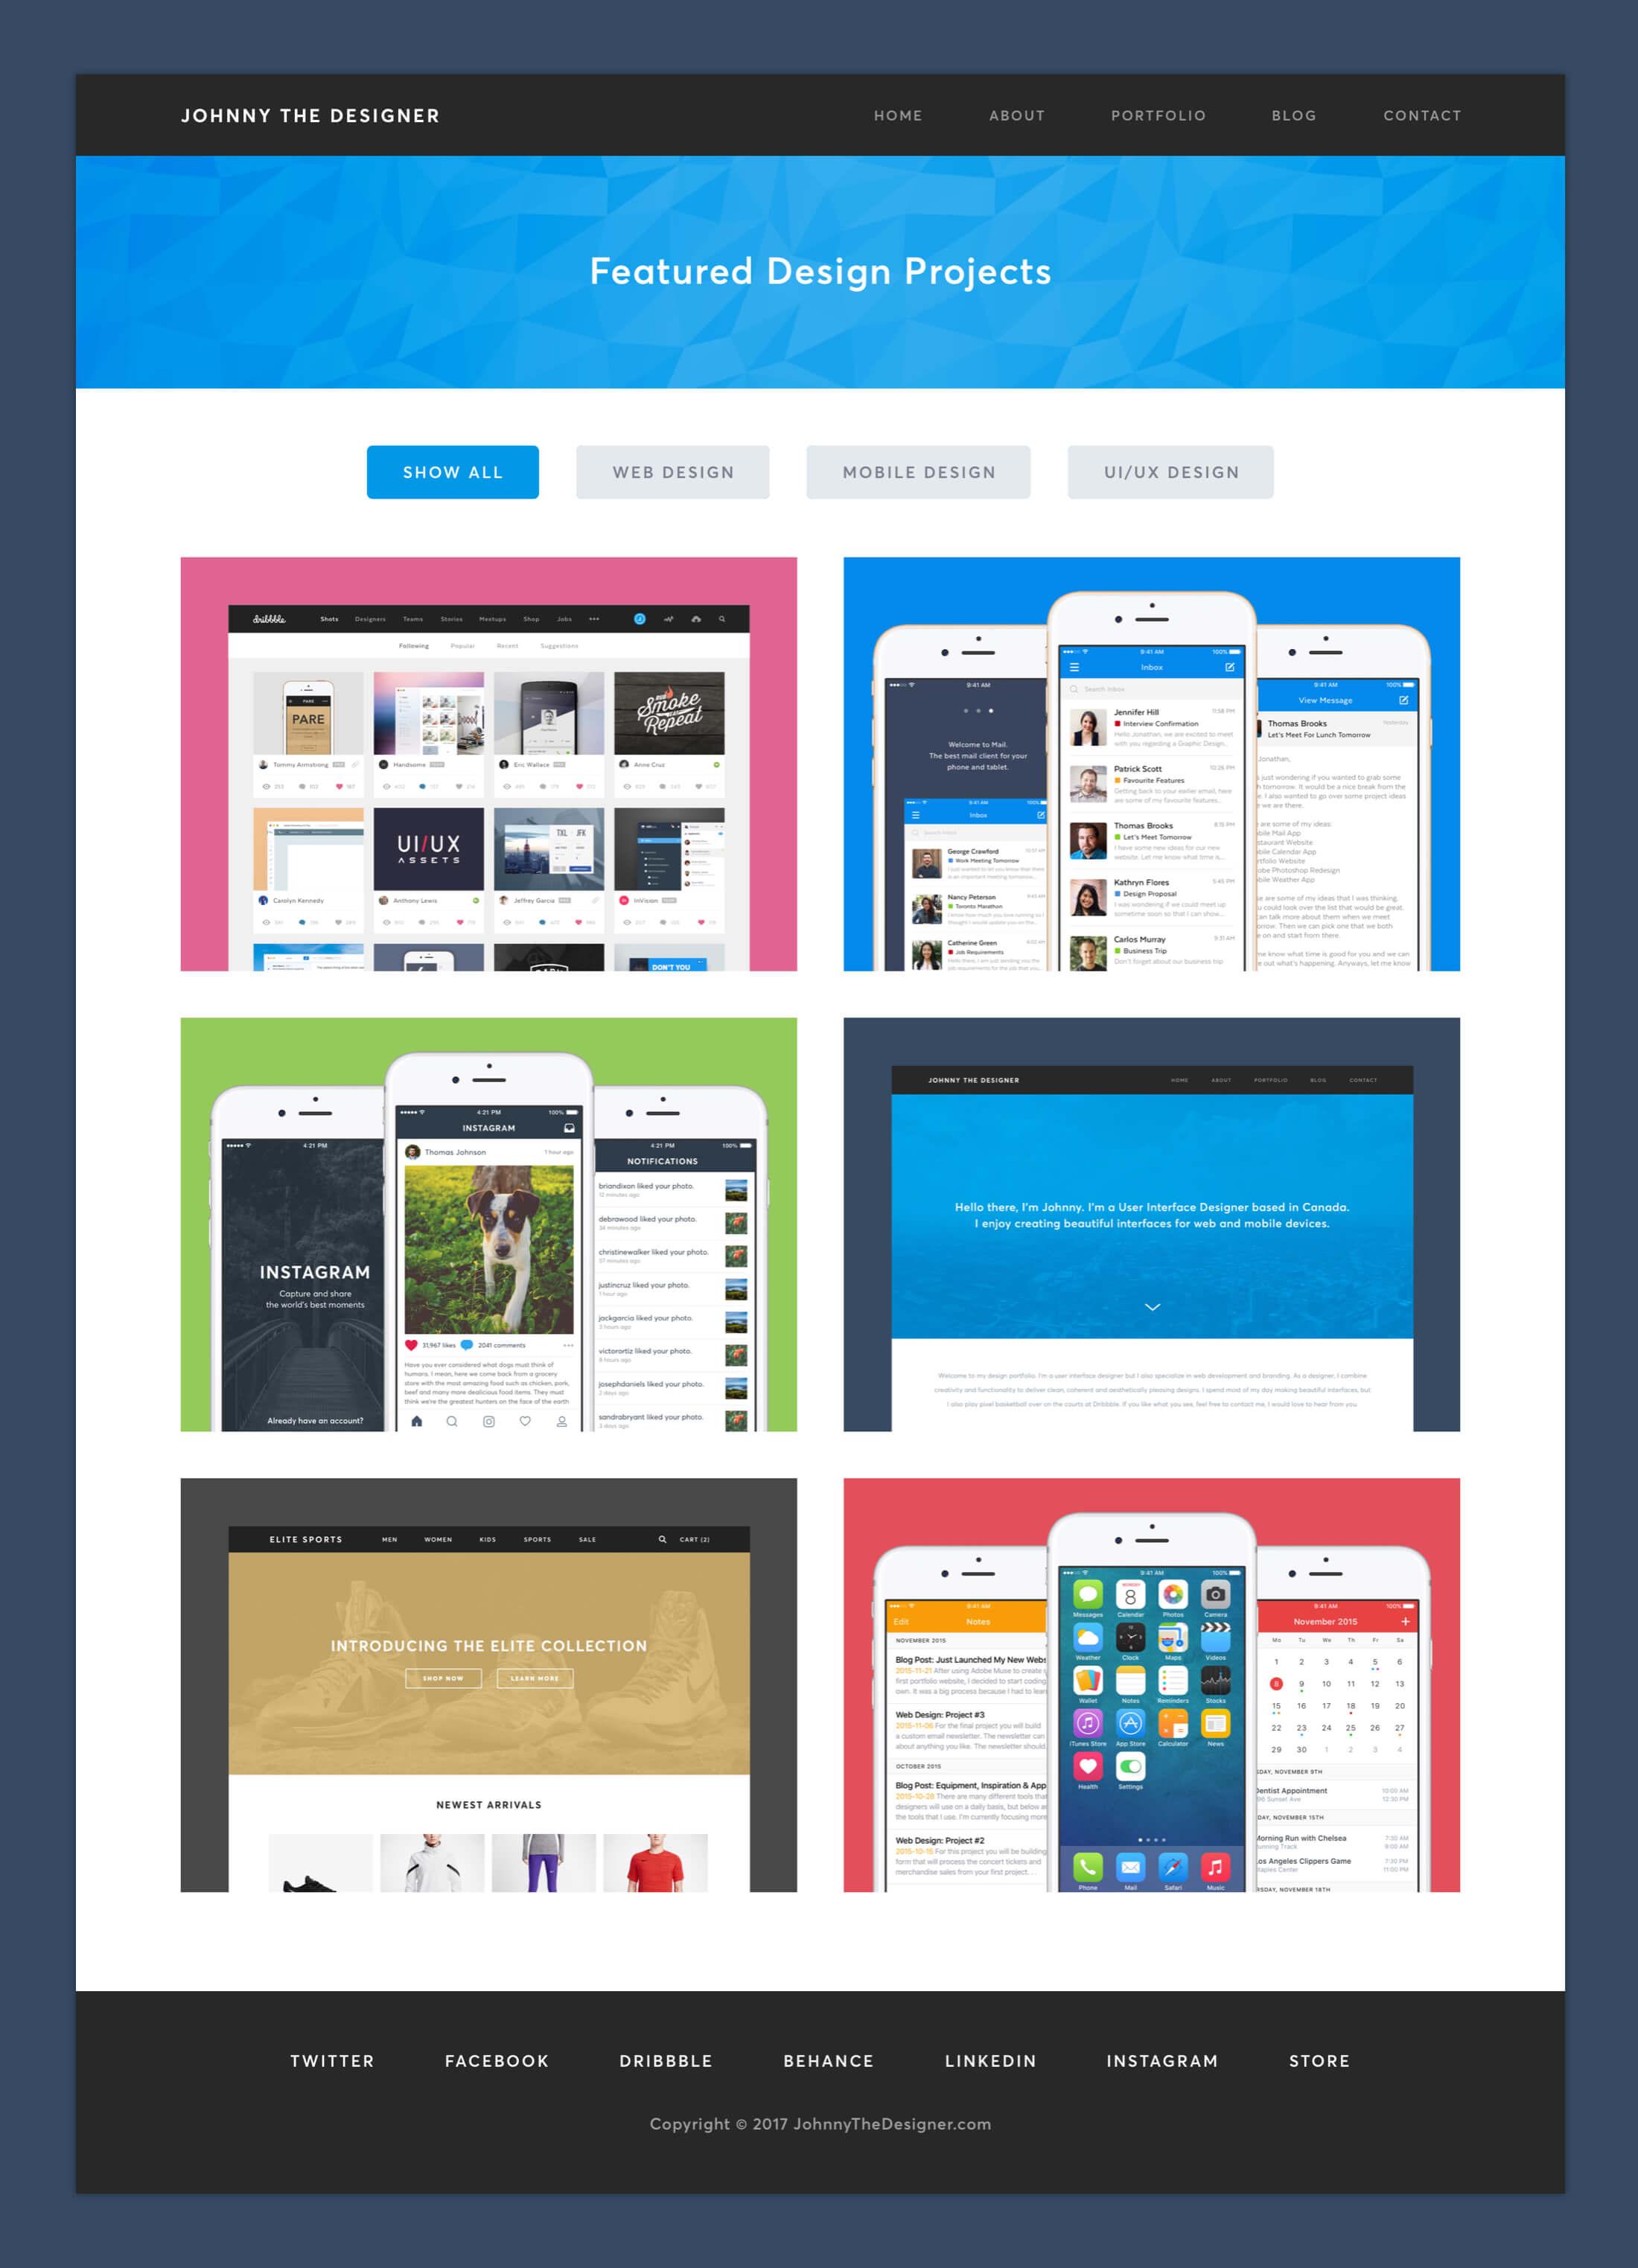 Personal Website - Portfolio Page